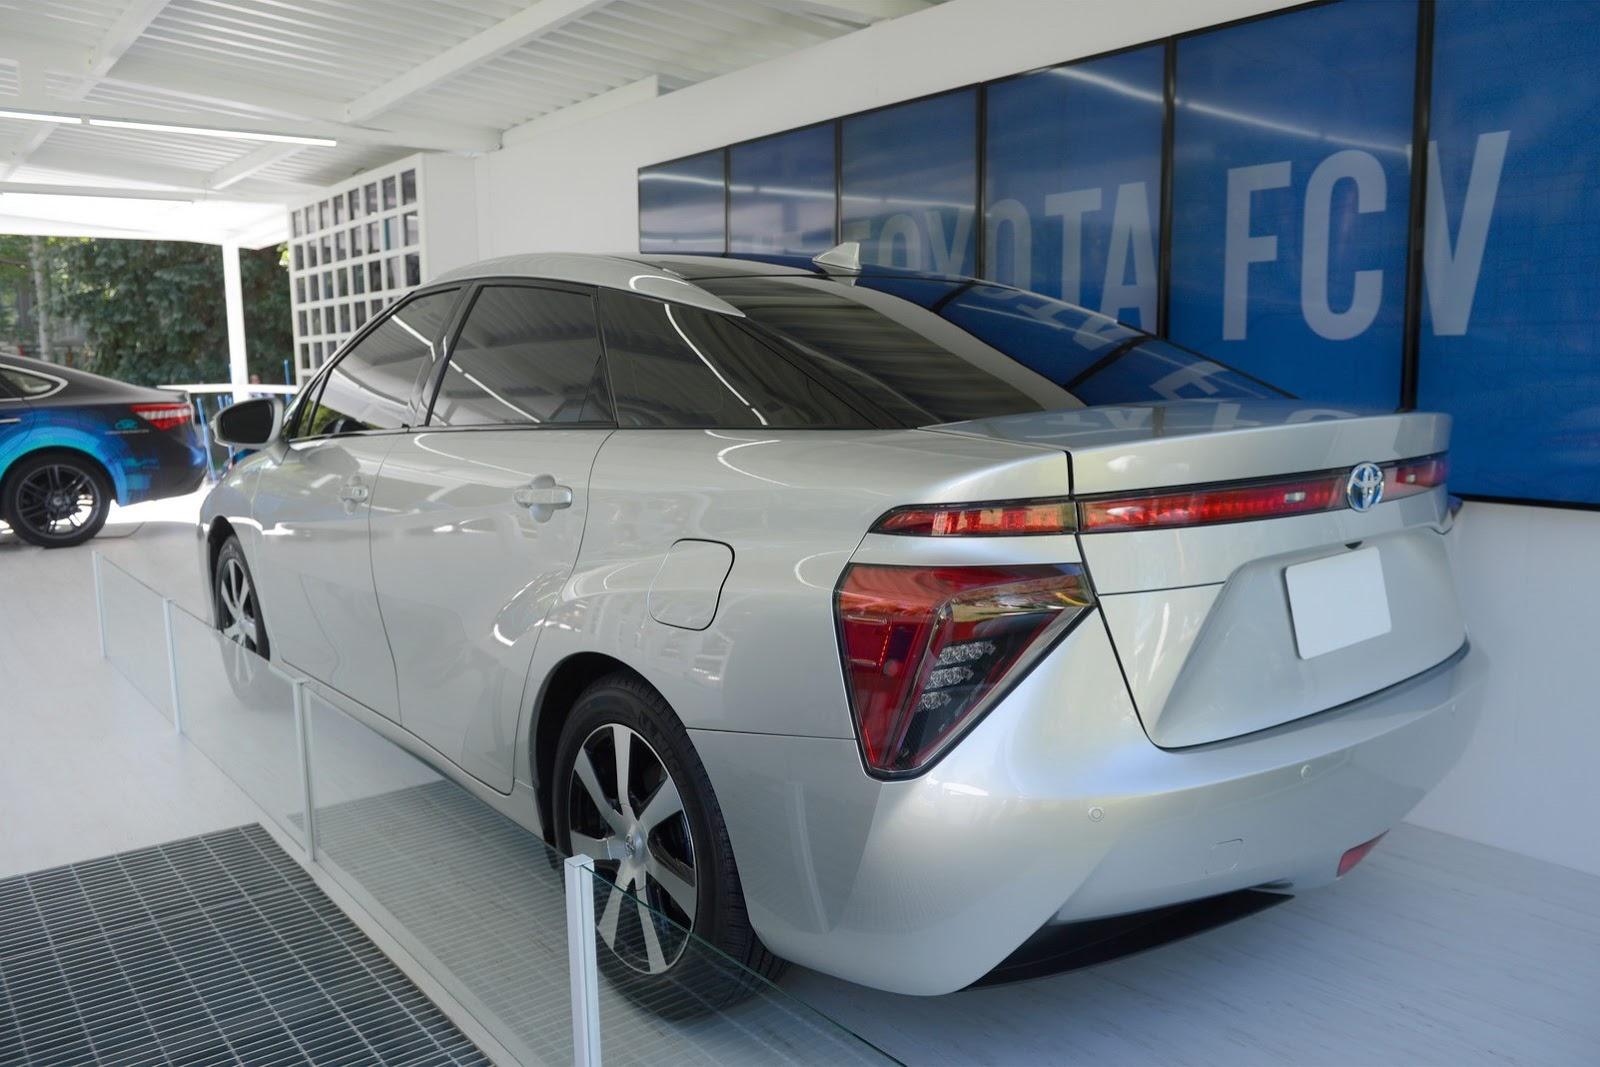 2015 - [Toyota] FCV / Mirai - Page 2 Toyota-FCV-3%25255B2%25255D